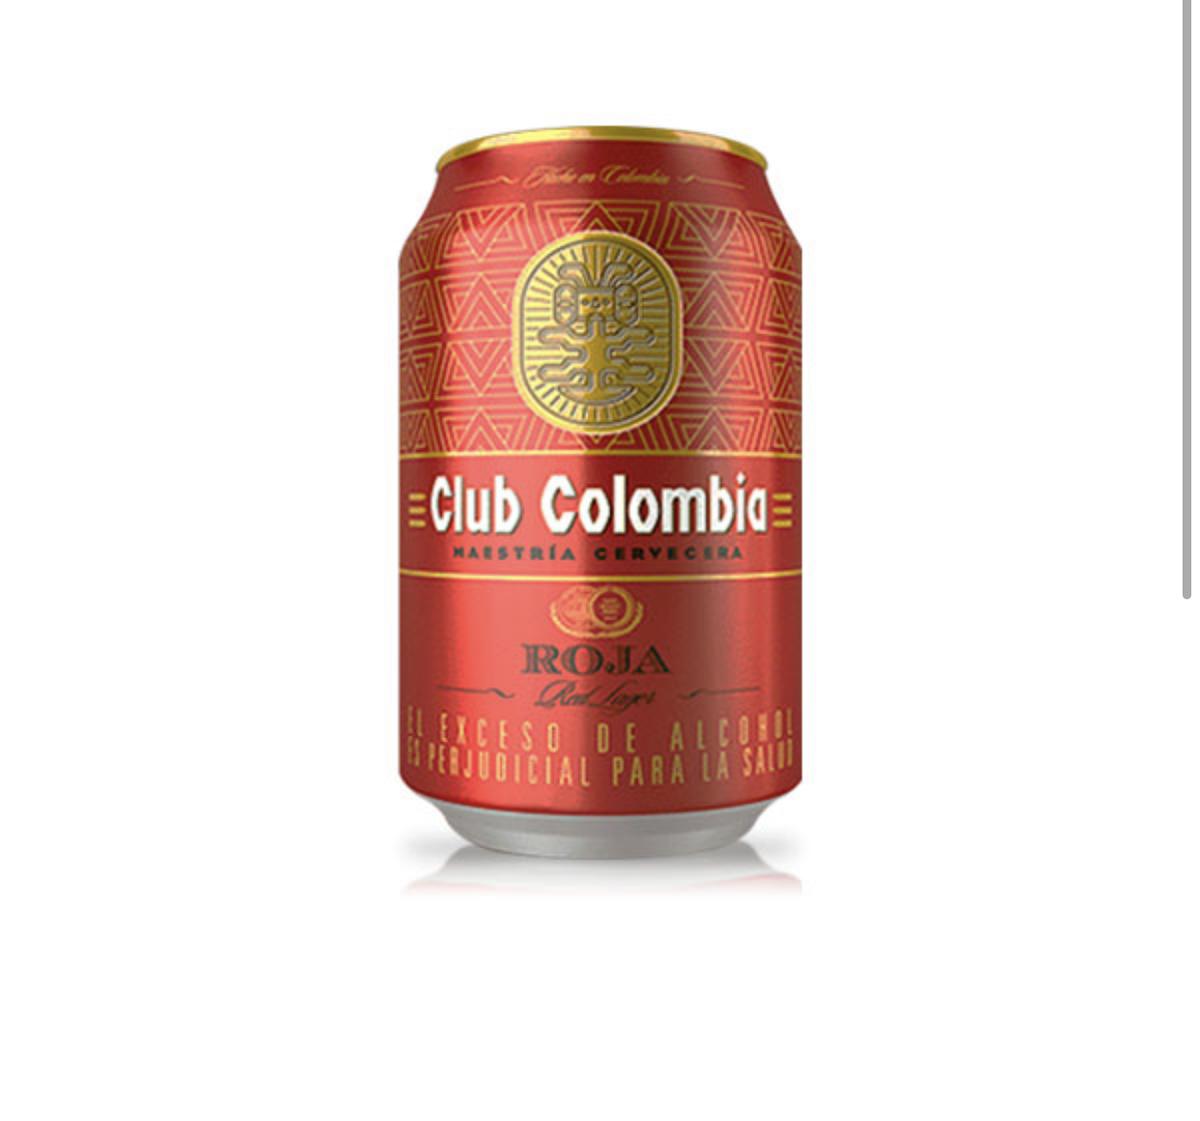 Club colombia Roja_1